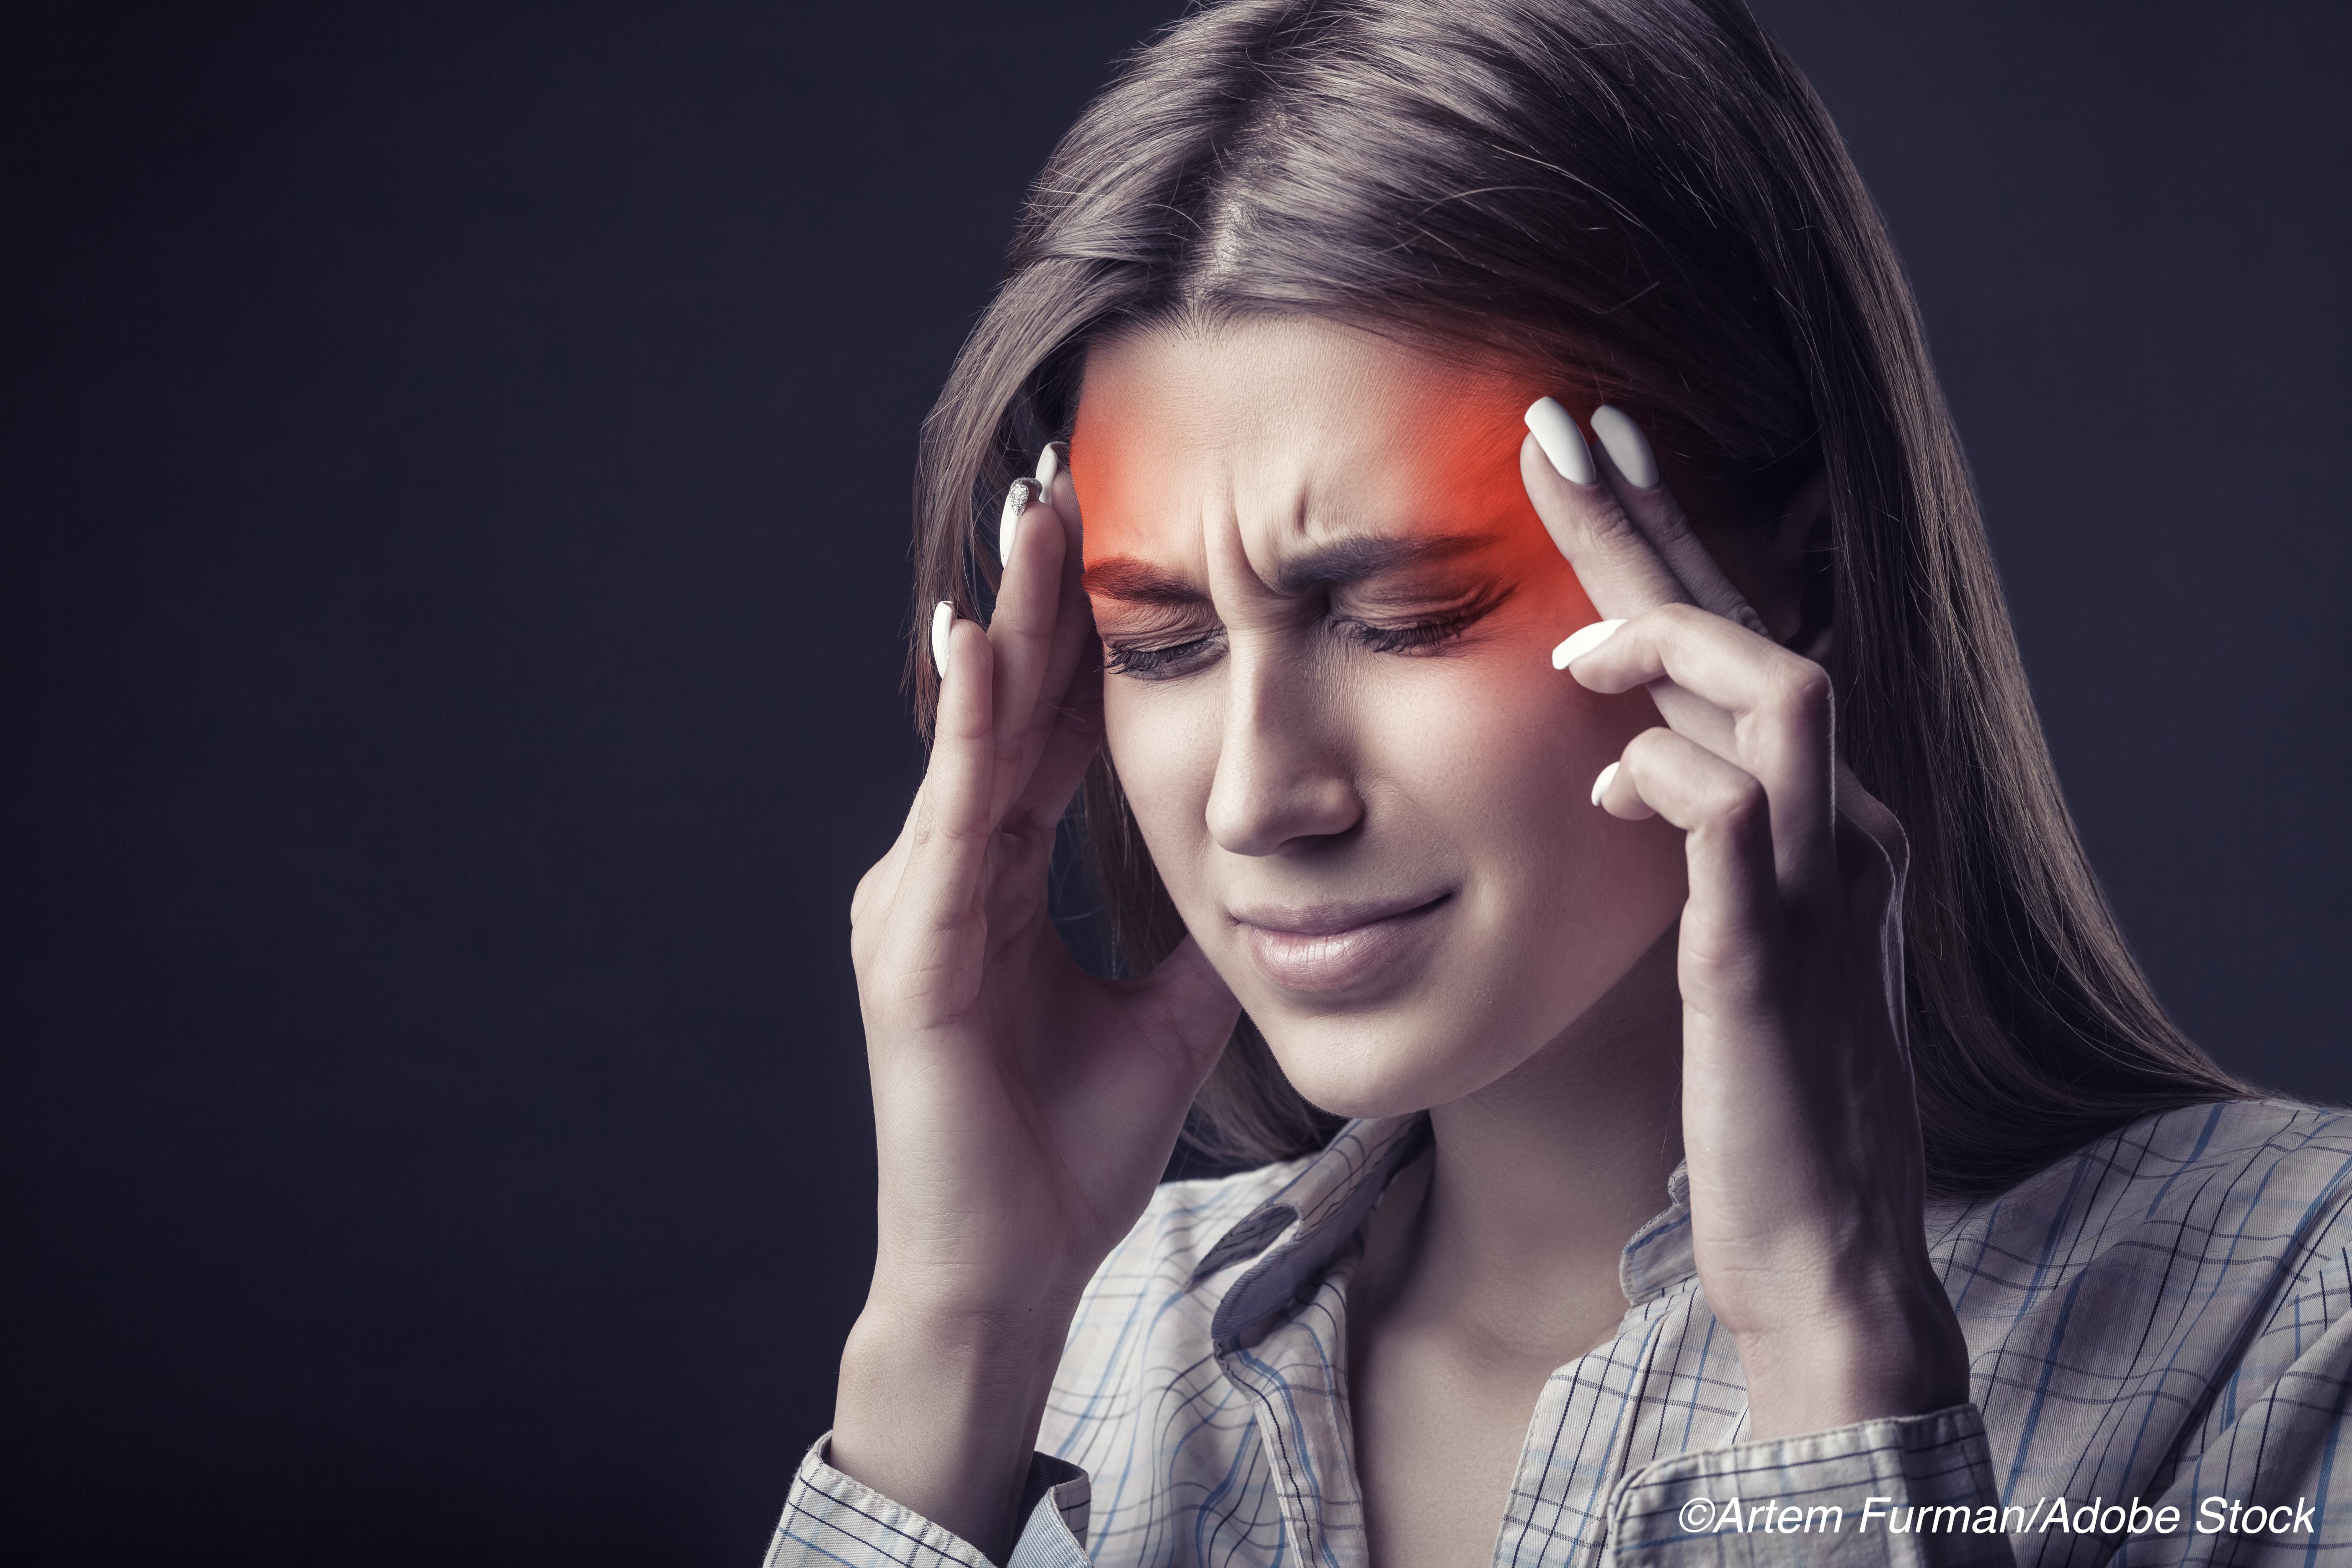 Migraine Prevention Benefit Seen for Rimegepant